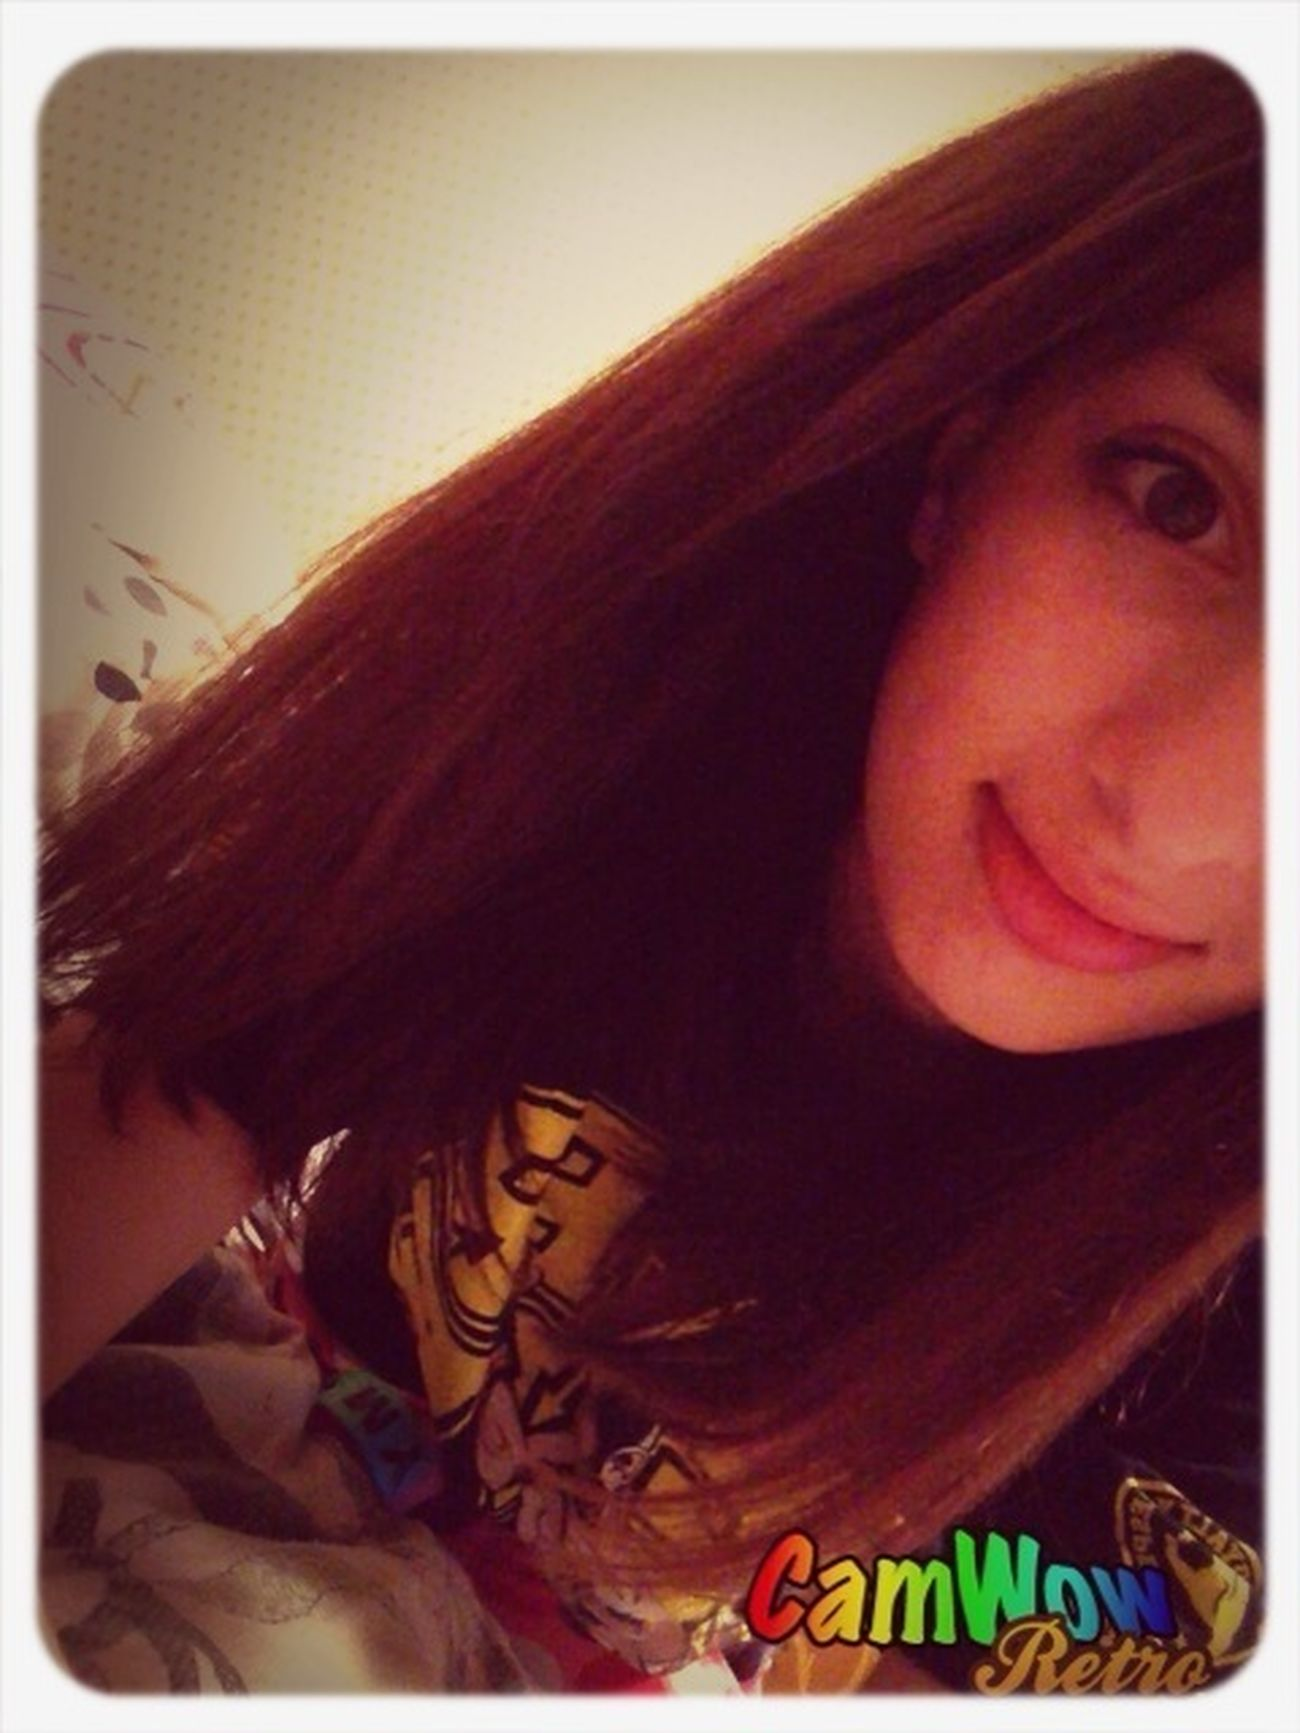 My Hair(;